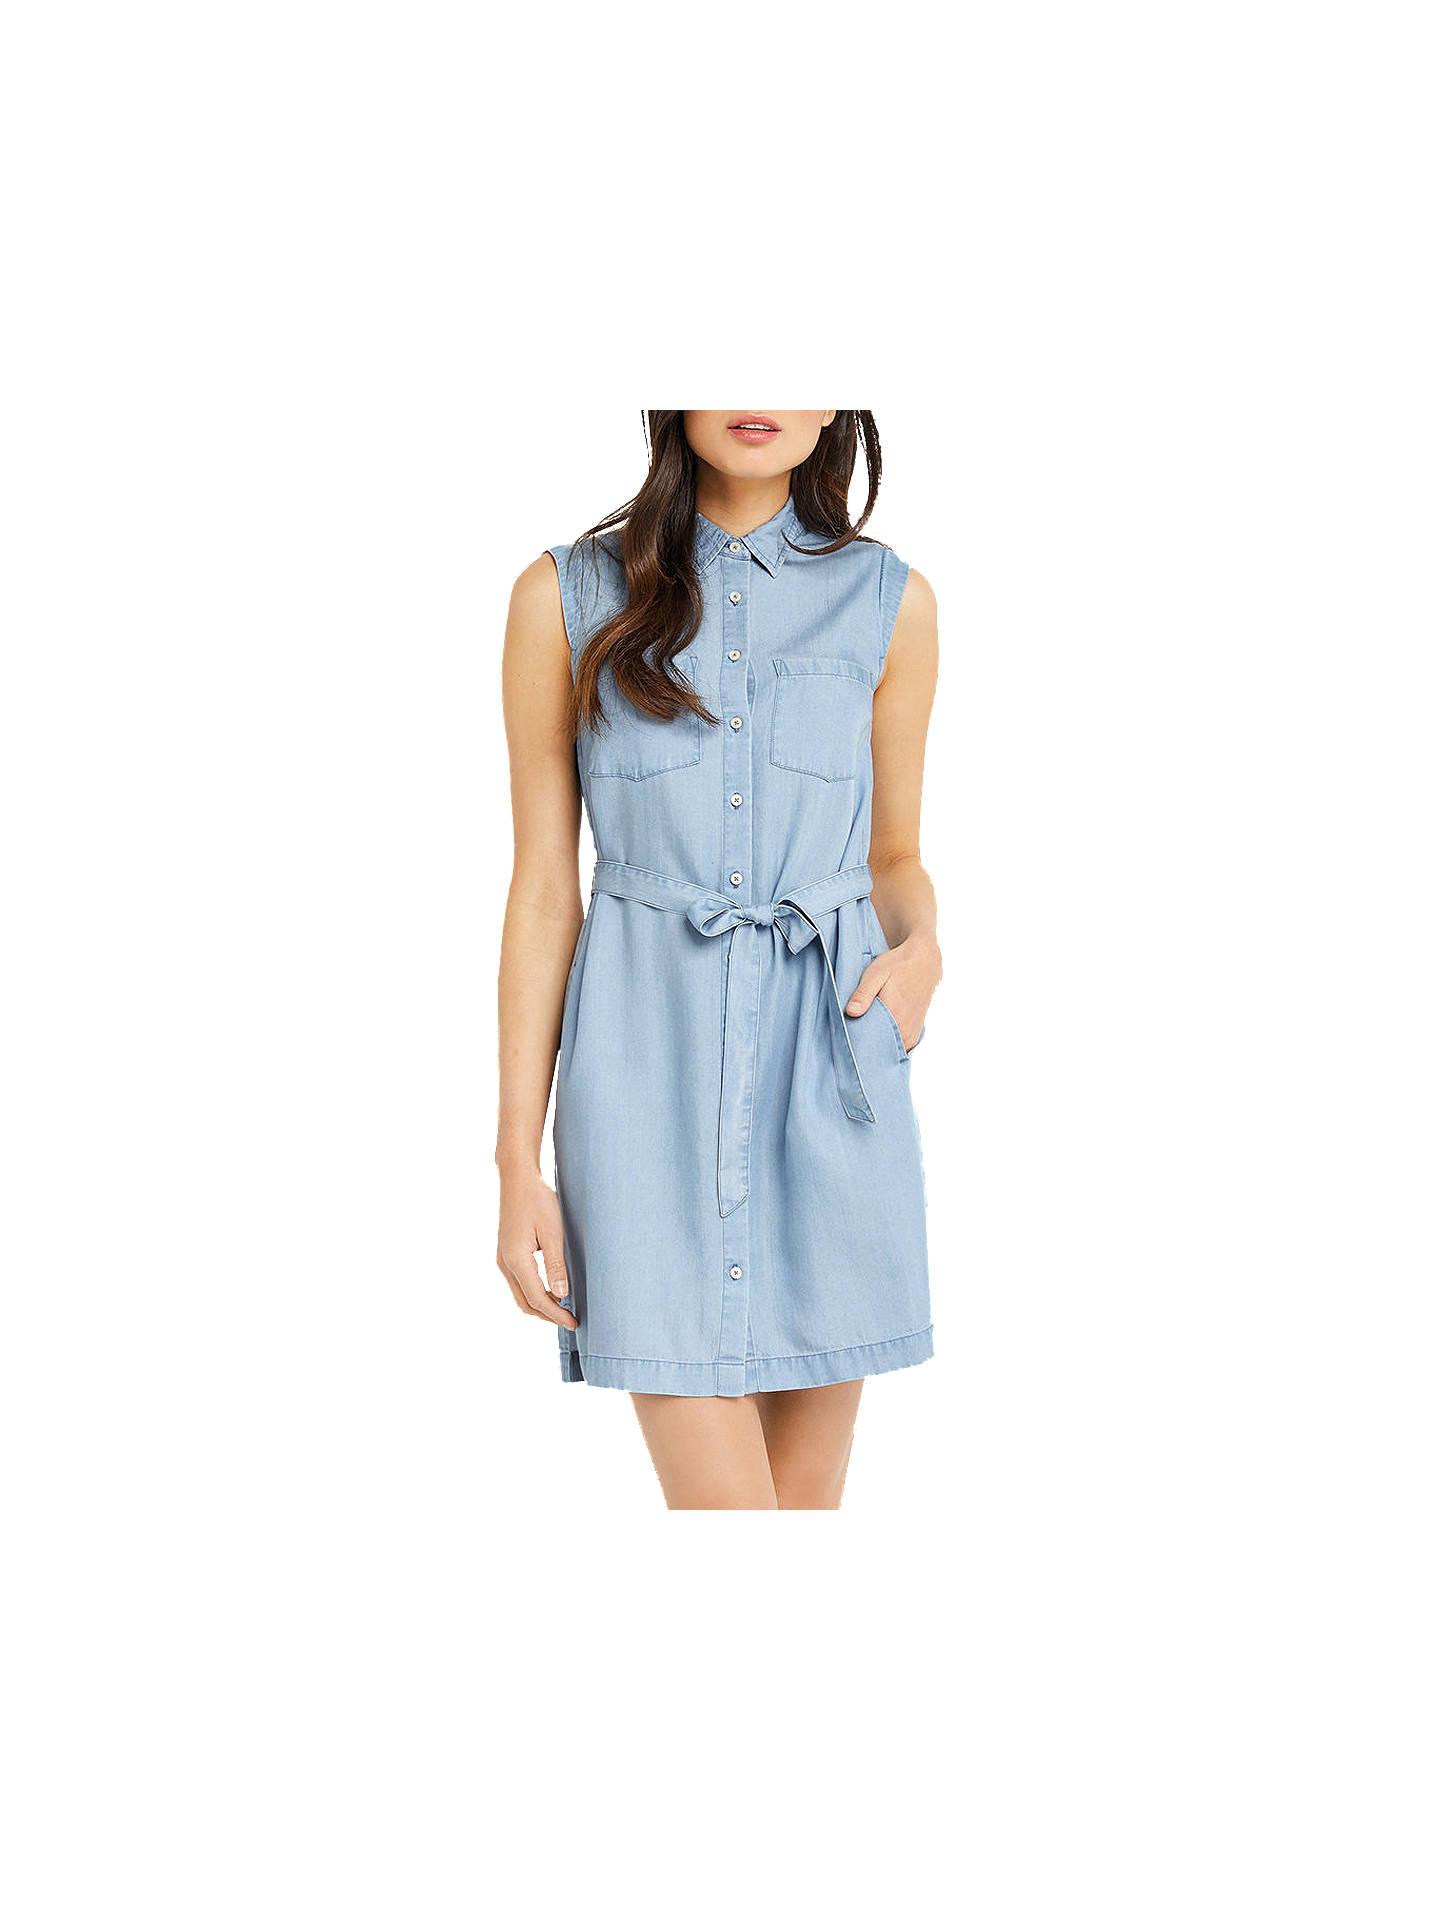 46779019d05f55 Buy Oasis Edie Sleeveless Shirt Dress